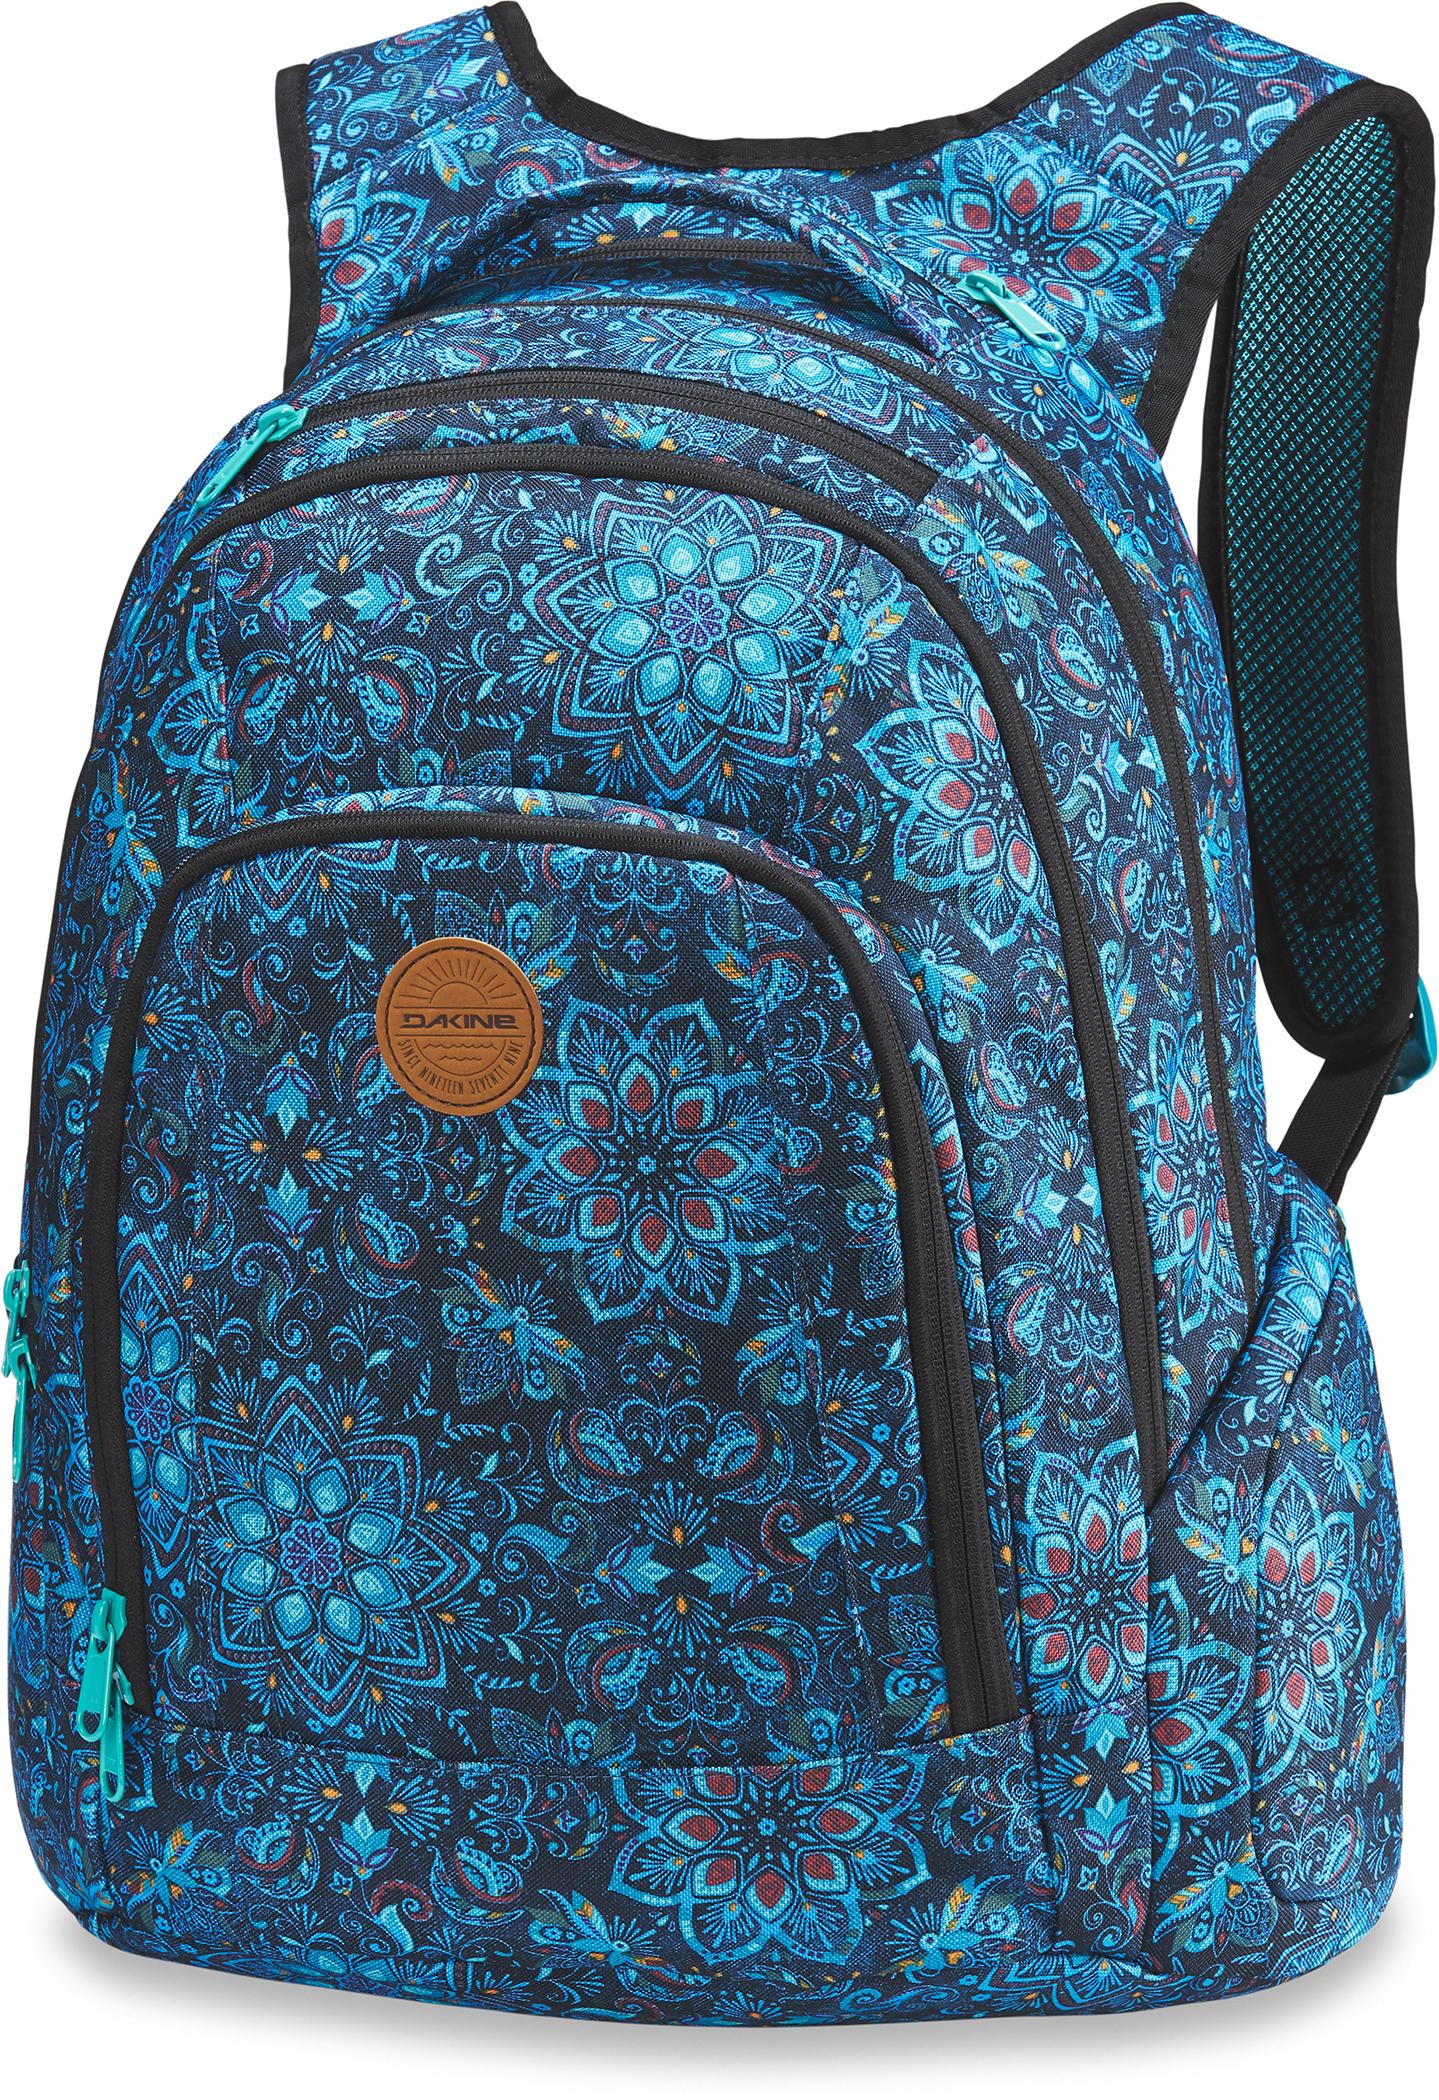 4889f732c373c Dakine Womens Backpack Frankie 26L 2018 Blue Magnolia 610934212358 ...